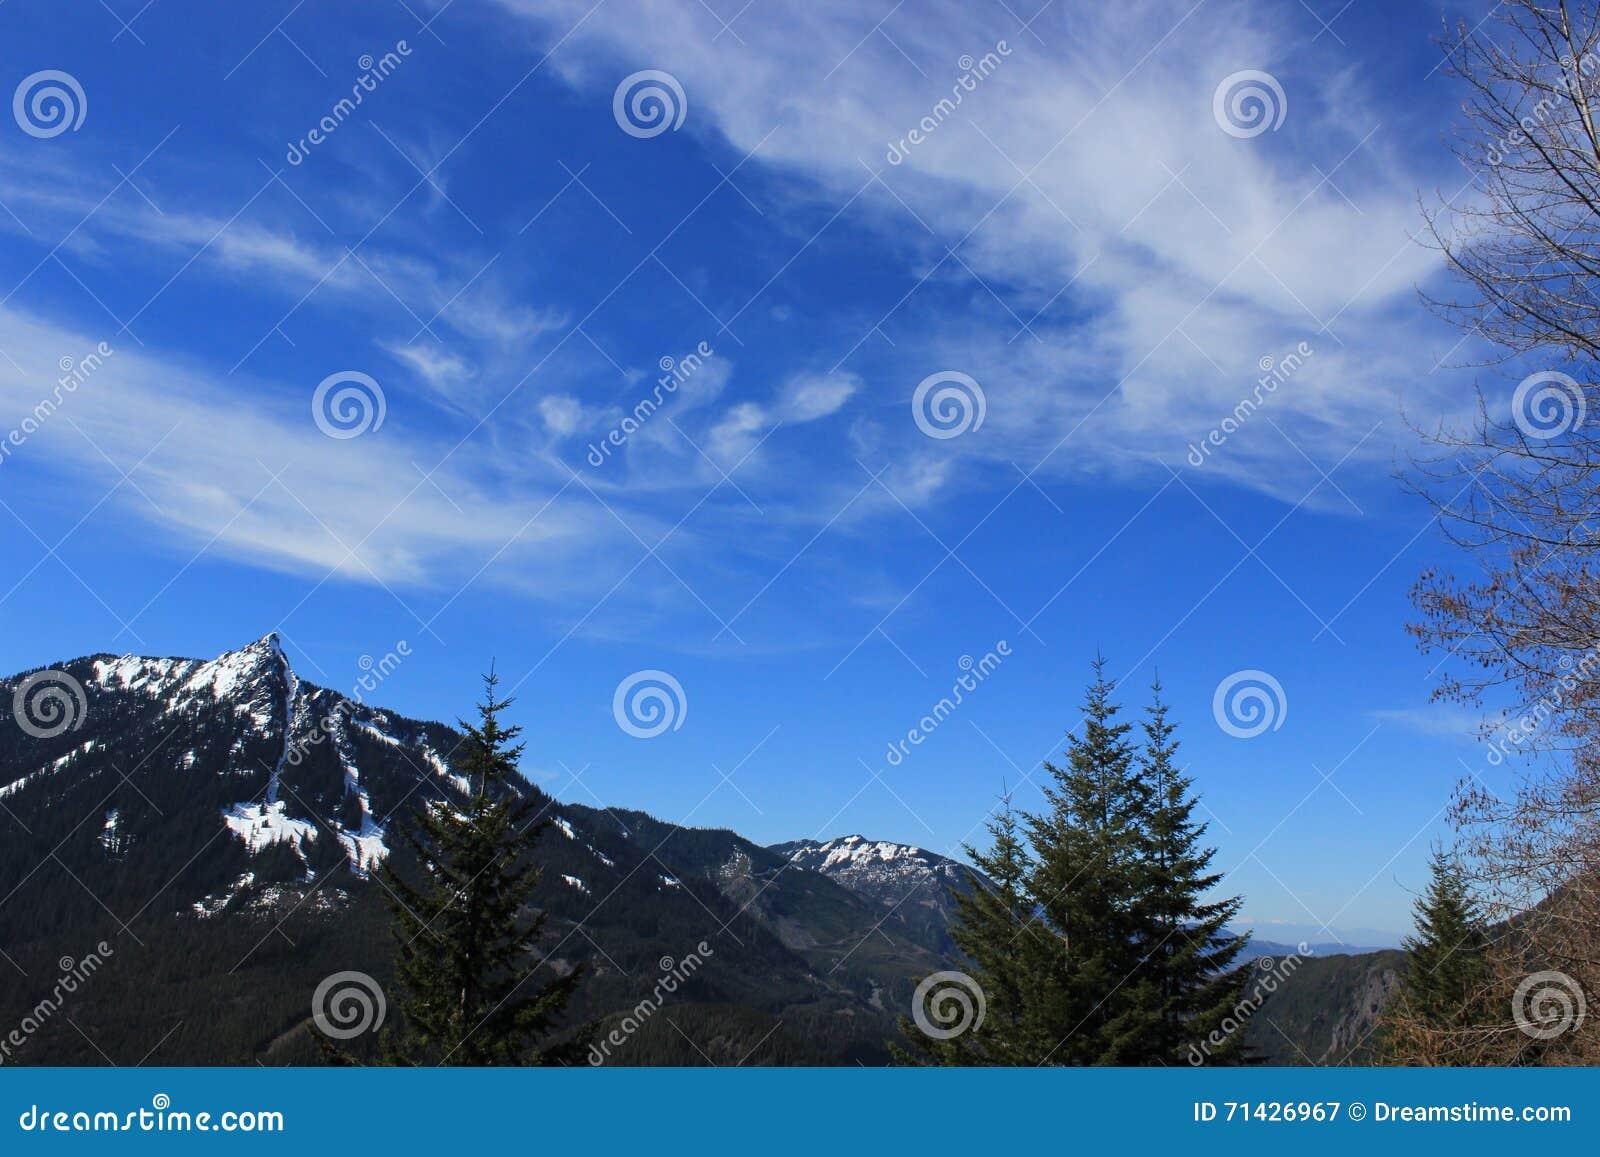 Ландшафт горы Snowy в штате Вашингтоне